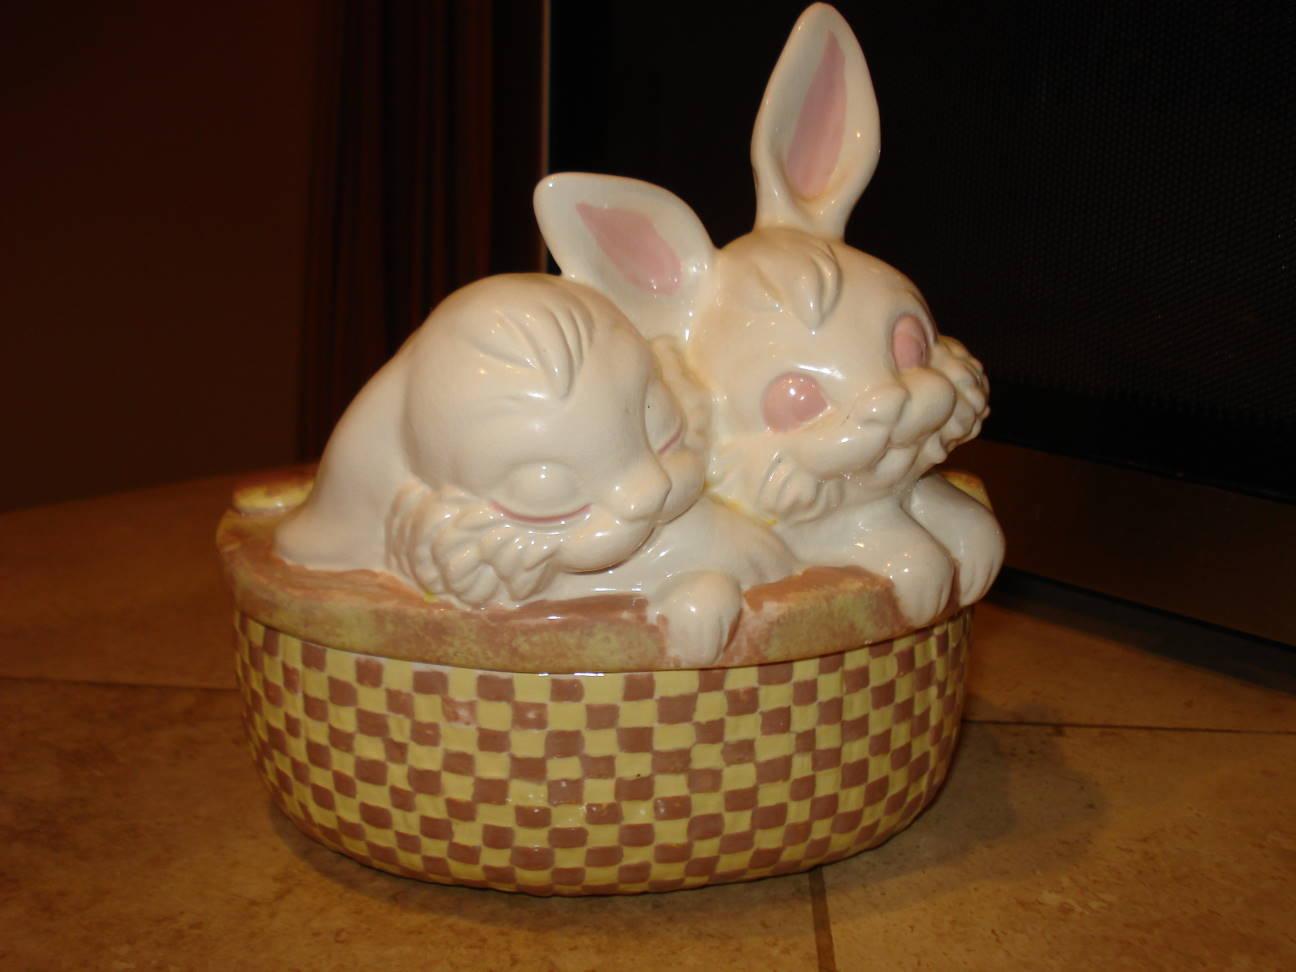 Keep the Bunnies or Make Them Hop Along?